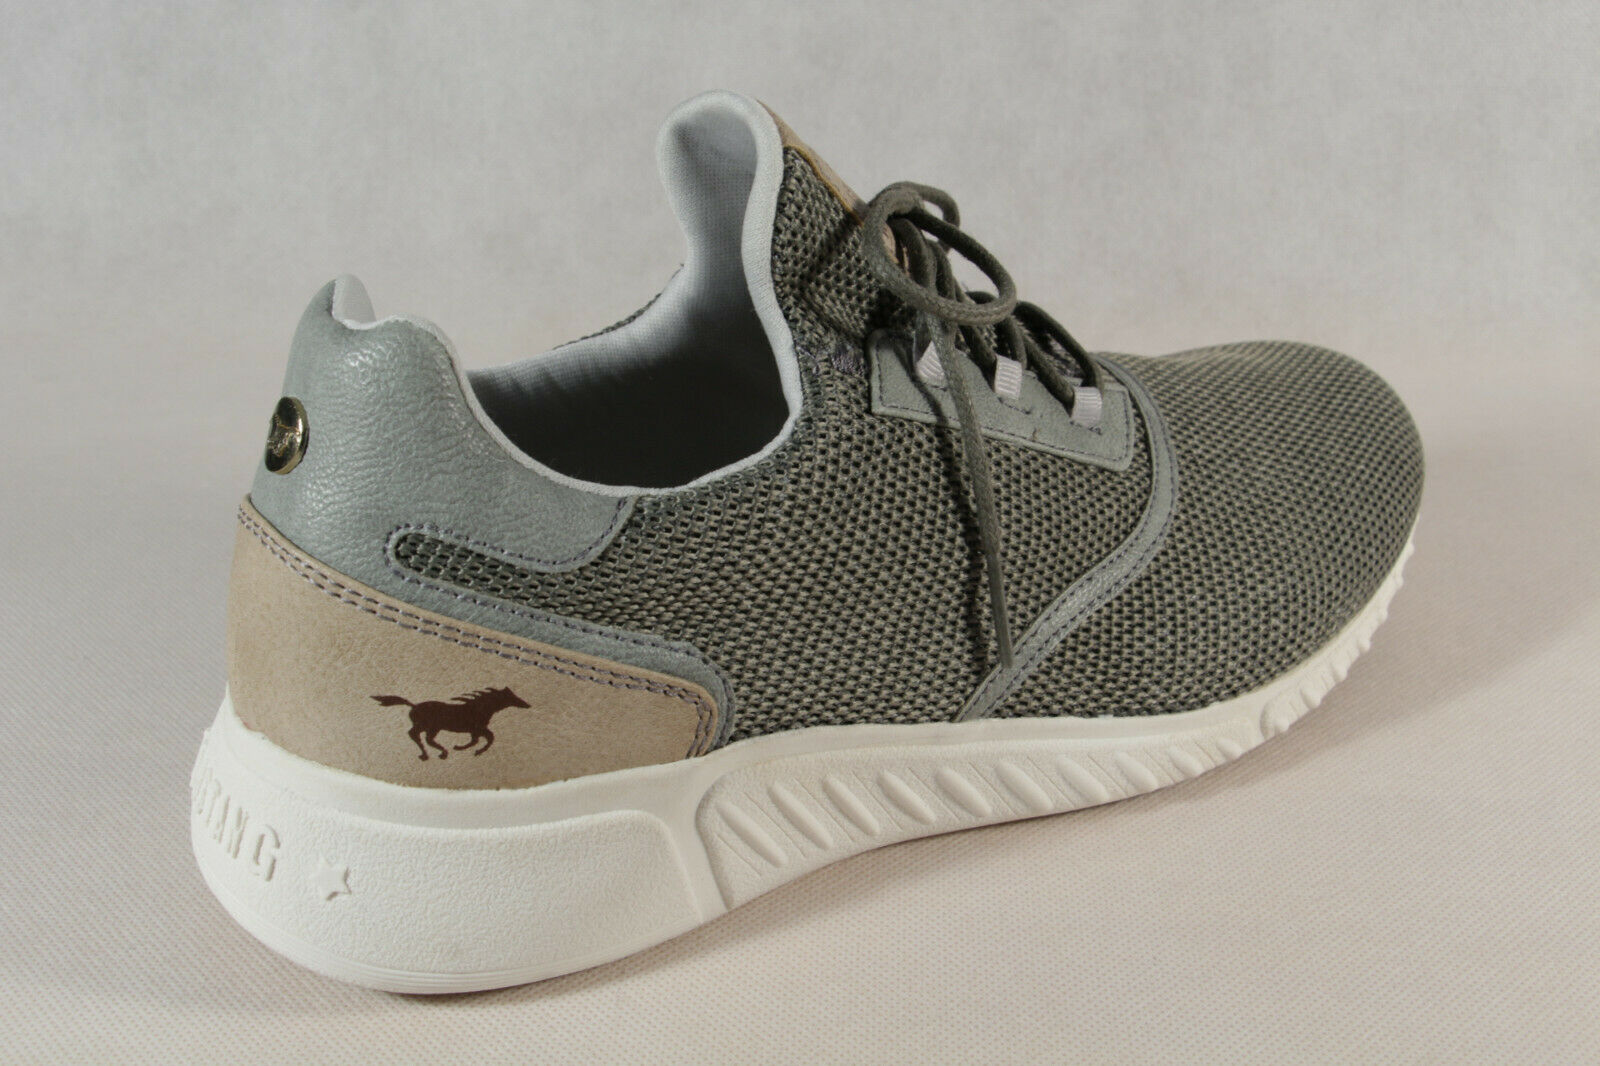 Mustang Slipper Sneakers Sportschuhe Halbschuhe rot Gummisohle 1315 NEU